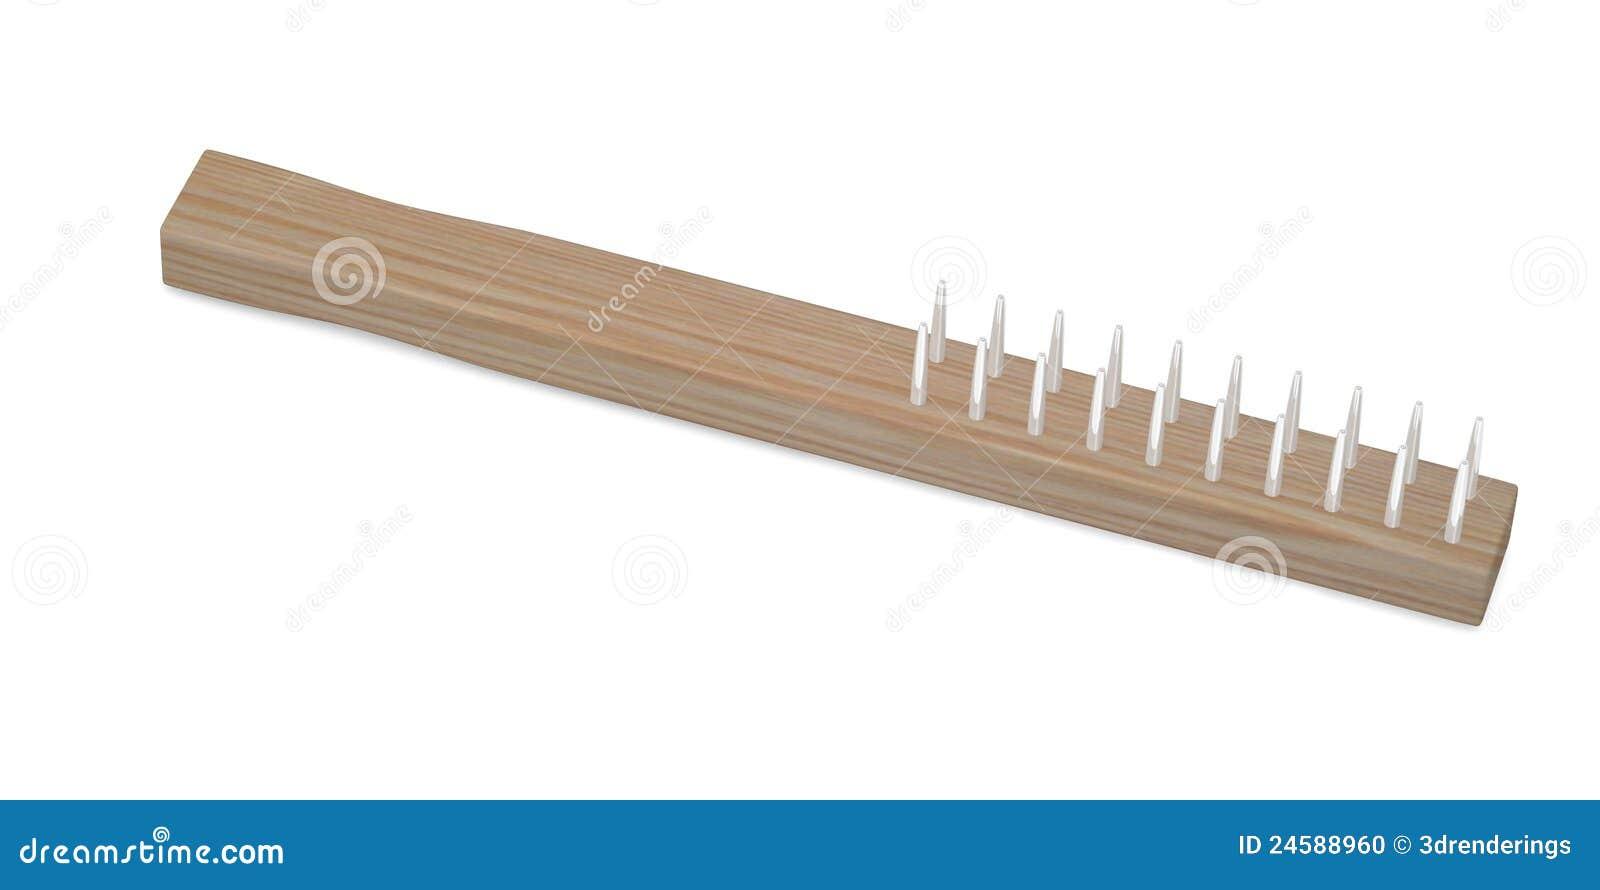 farming tool - small brush